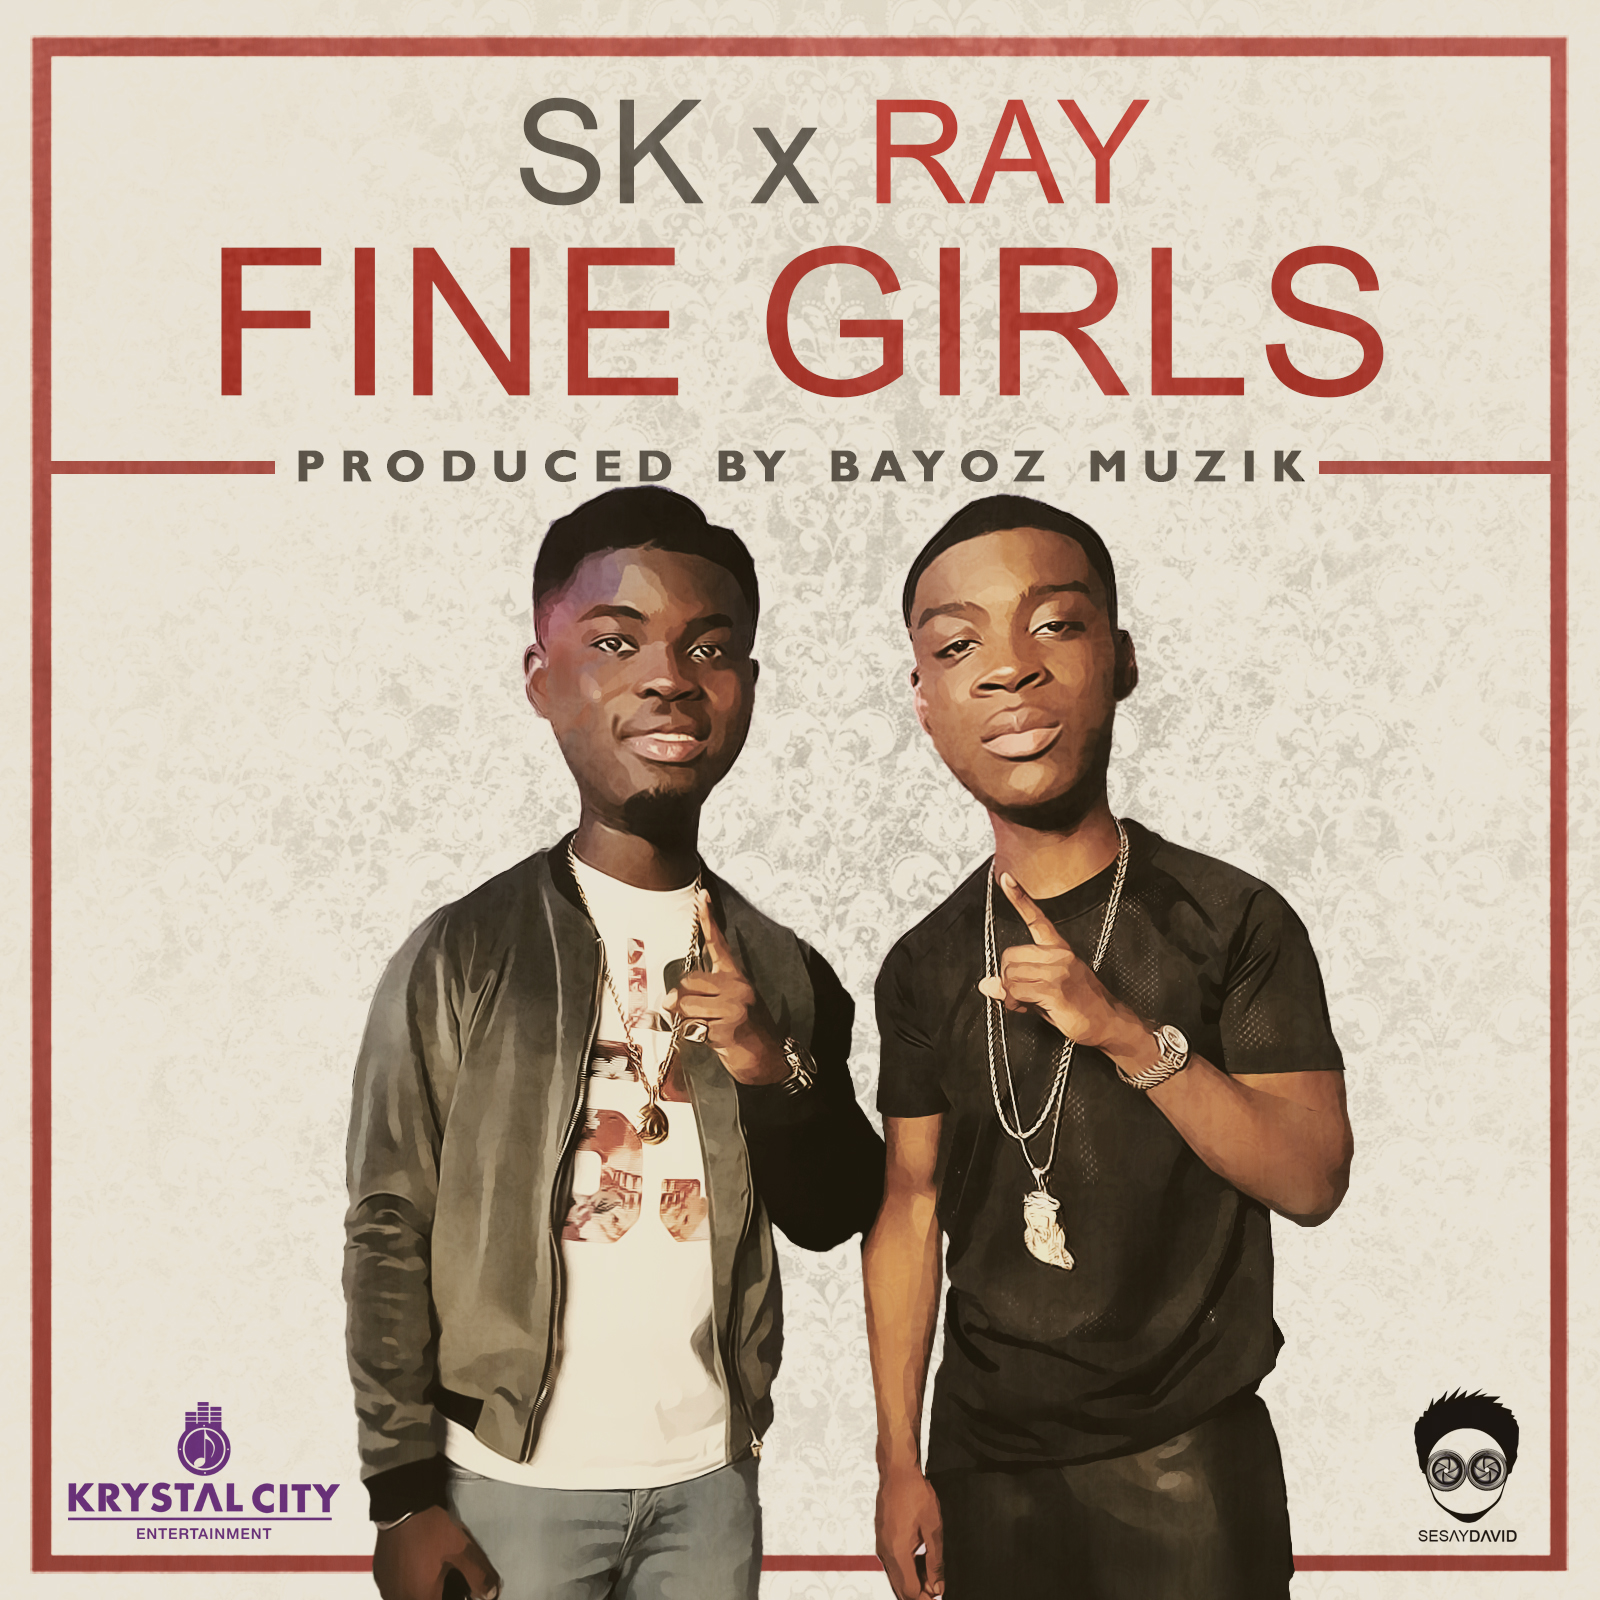 RAY X SK FINE GIRLS